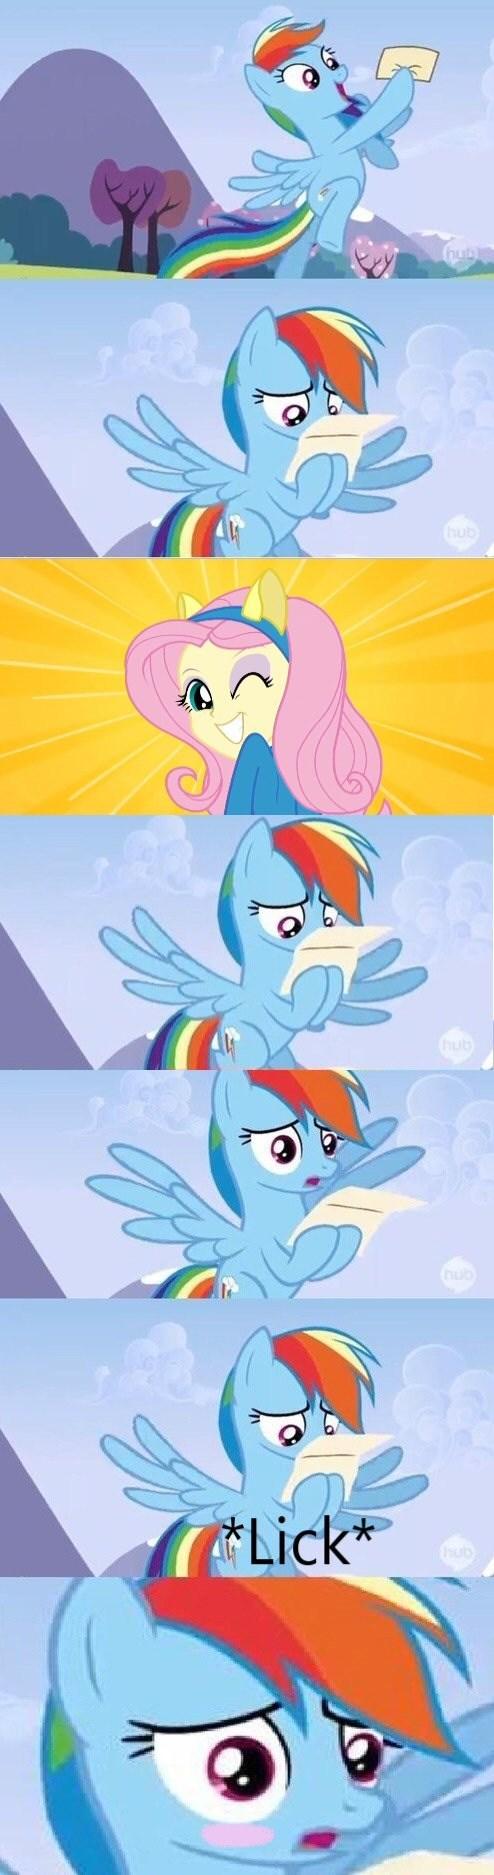 equestria girls licks Memes fluttershy rainbow dash - 7698372352